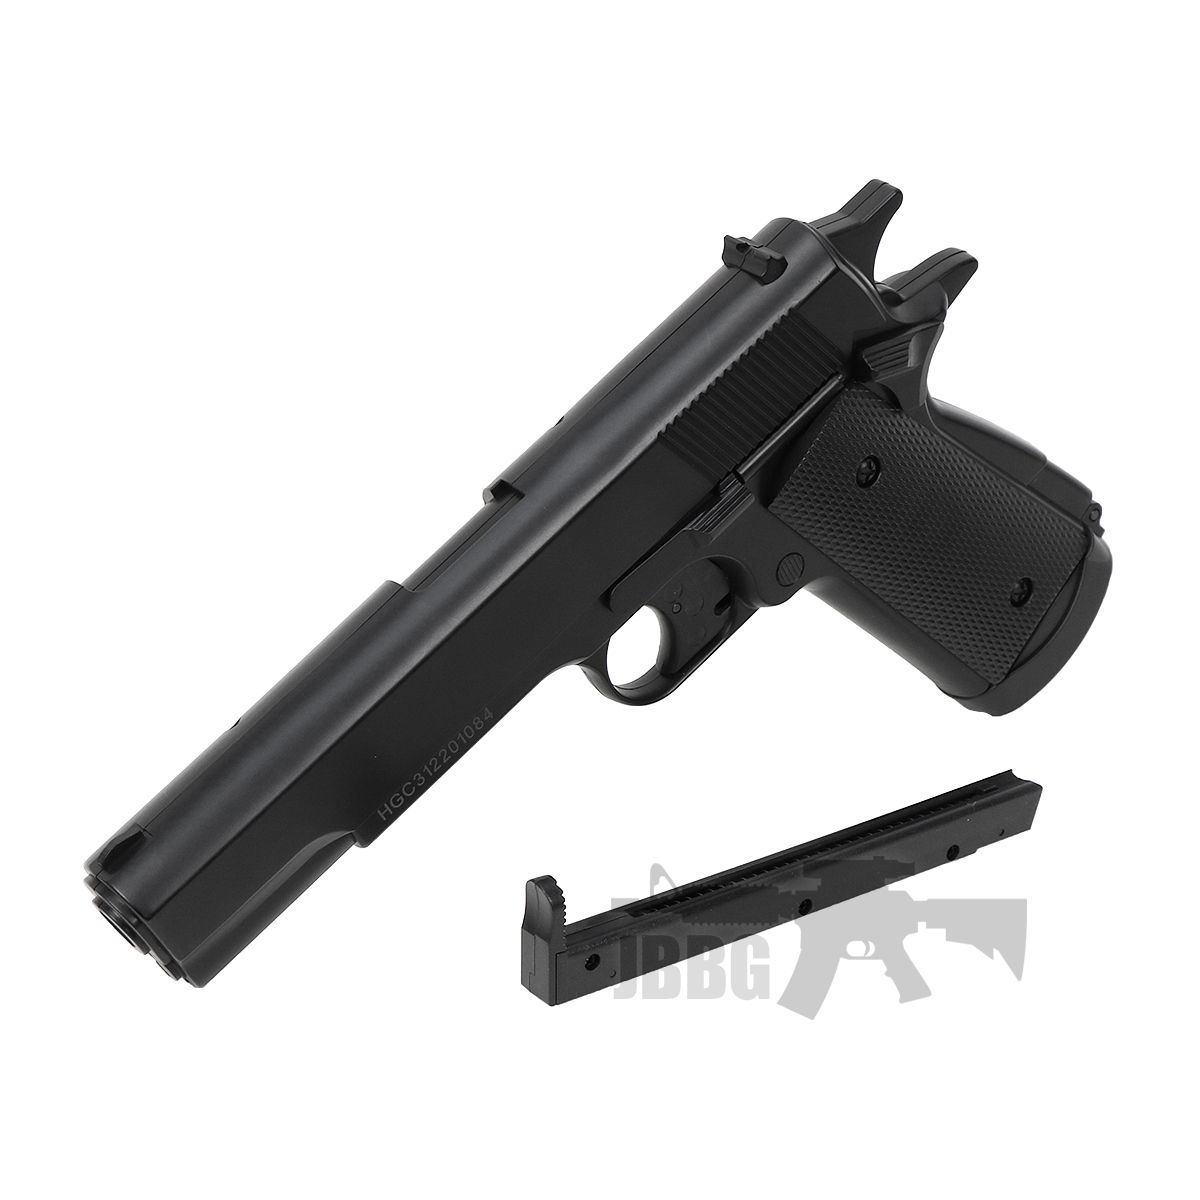 hgc312 airsoft gas pistol jbbg 4